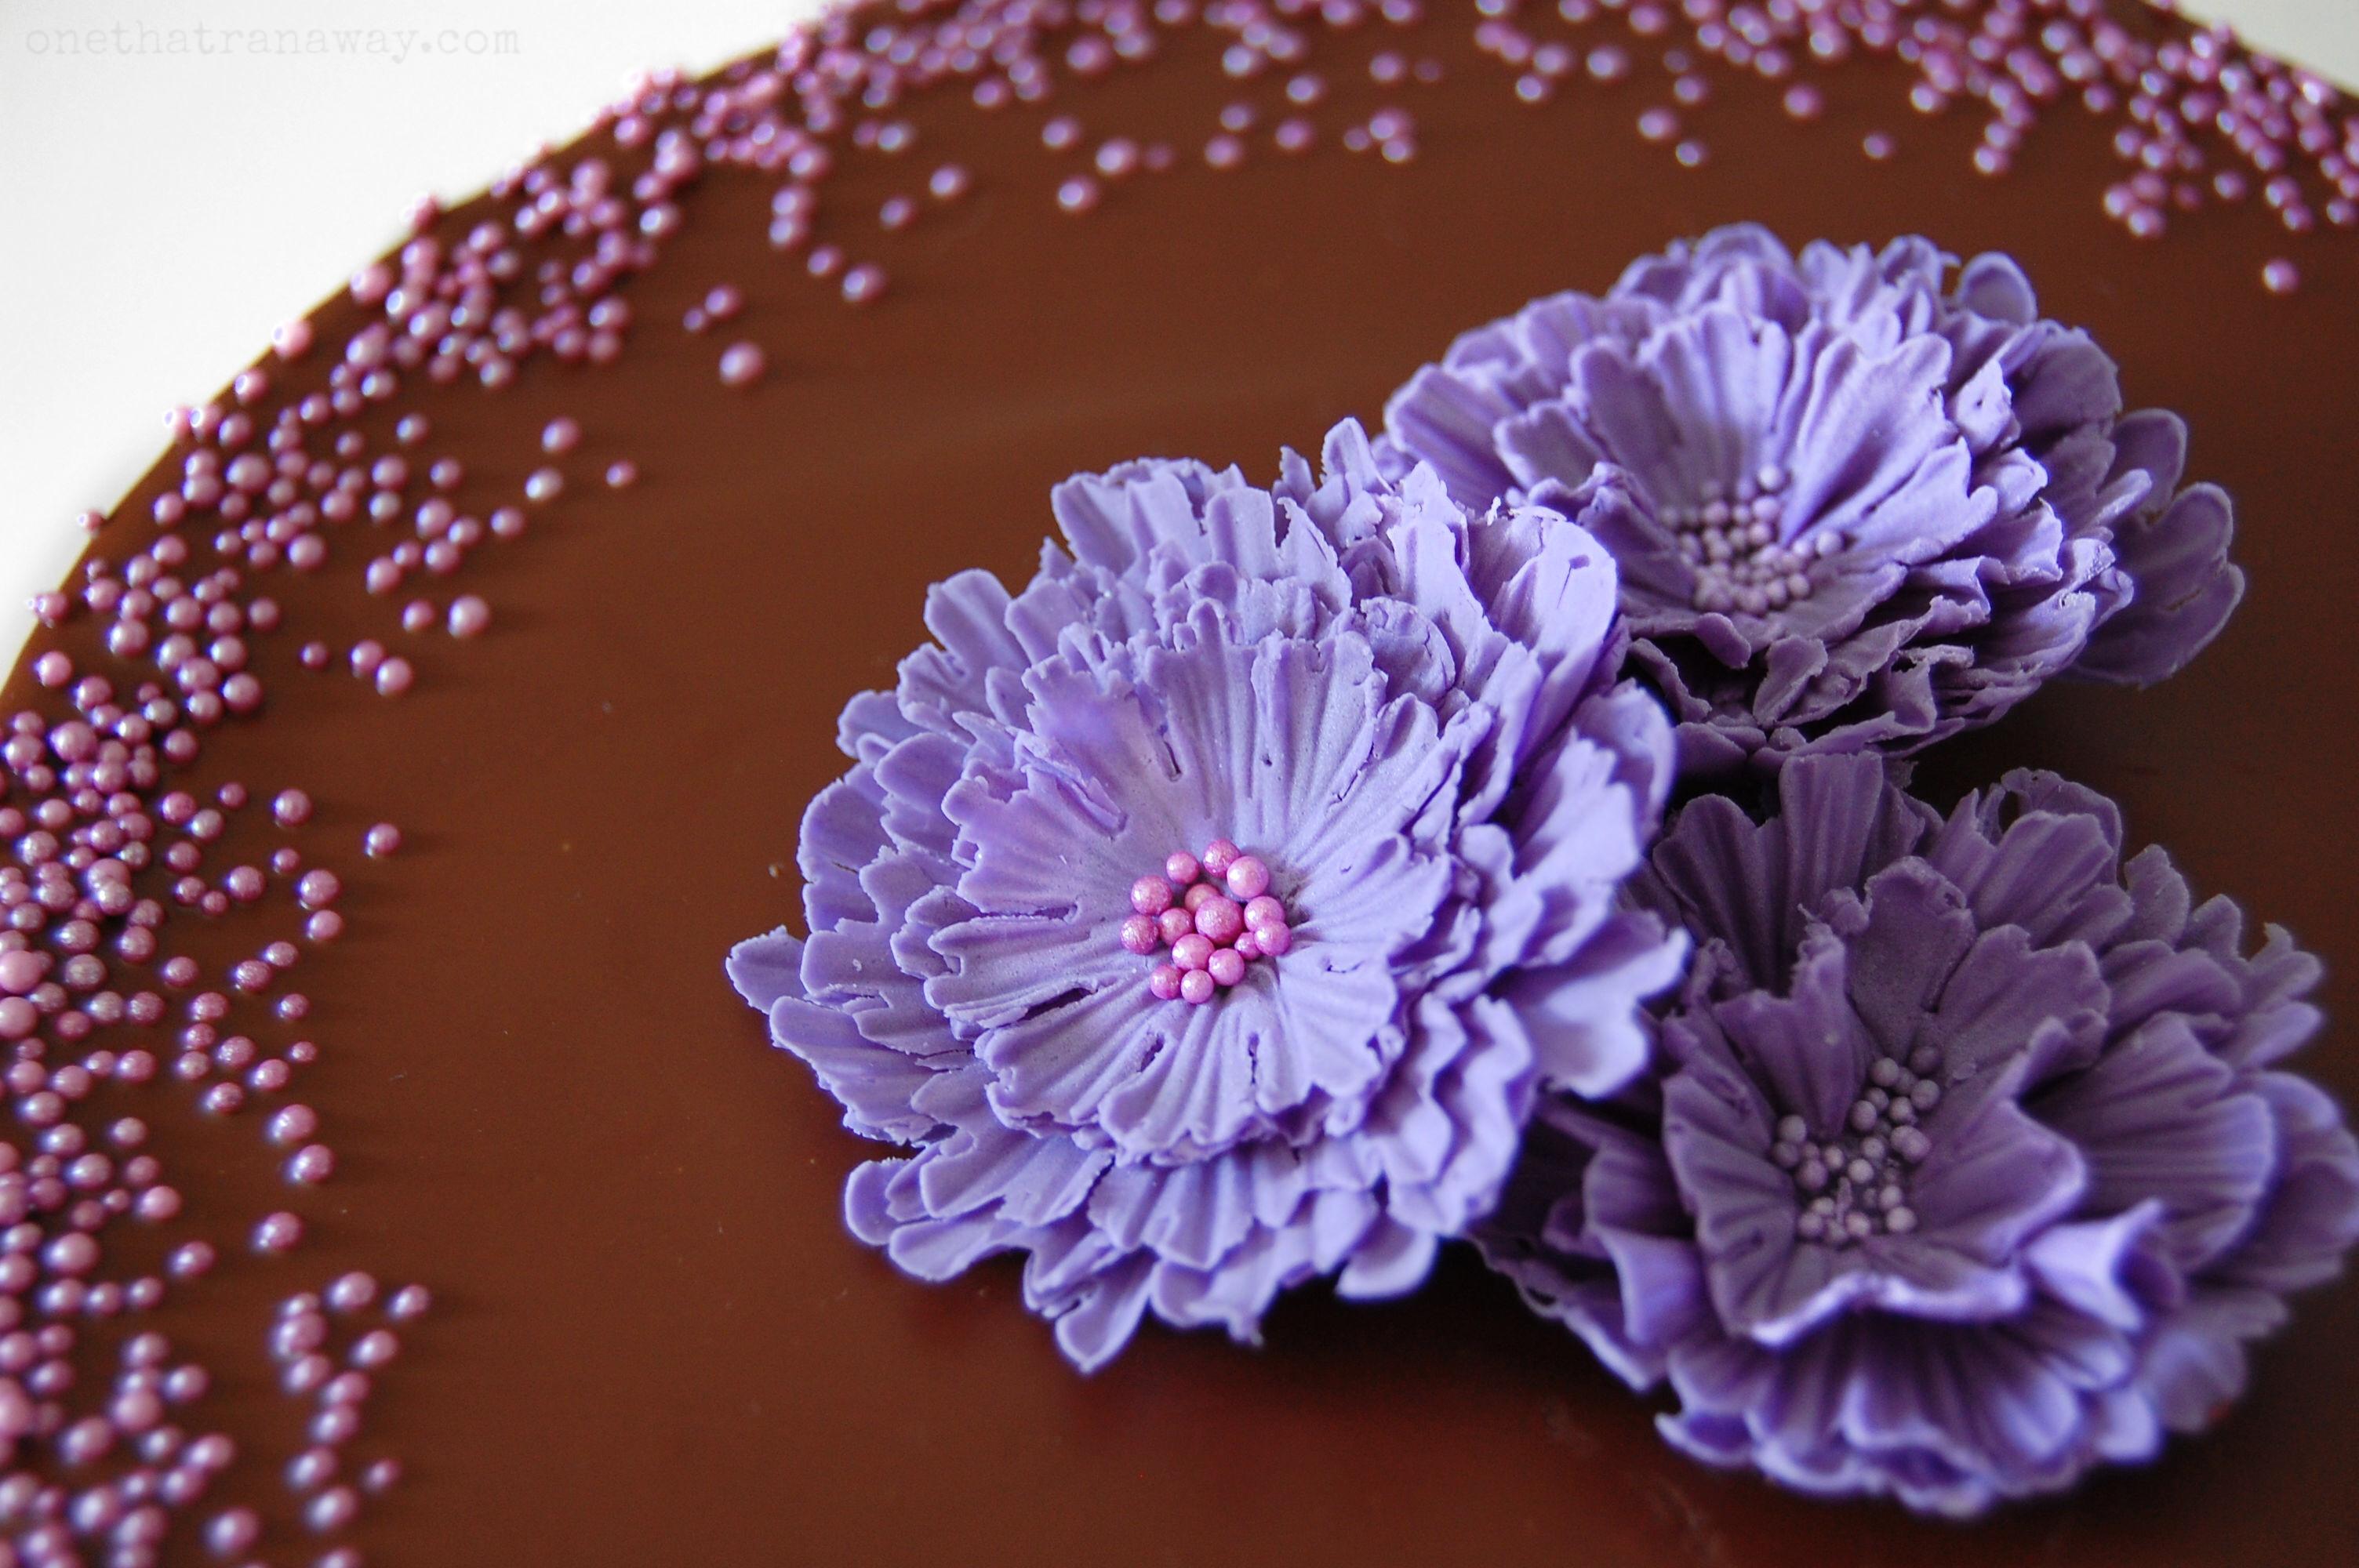 fondant flowers on chocolate cake